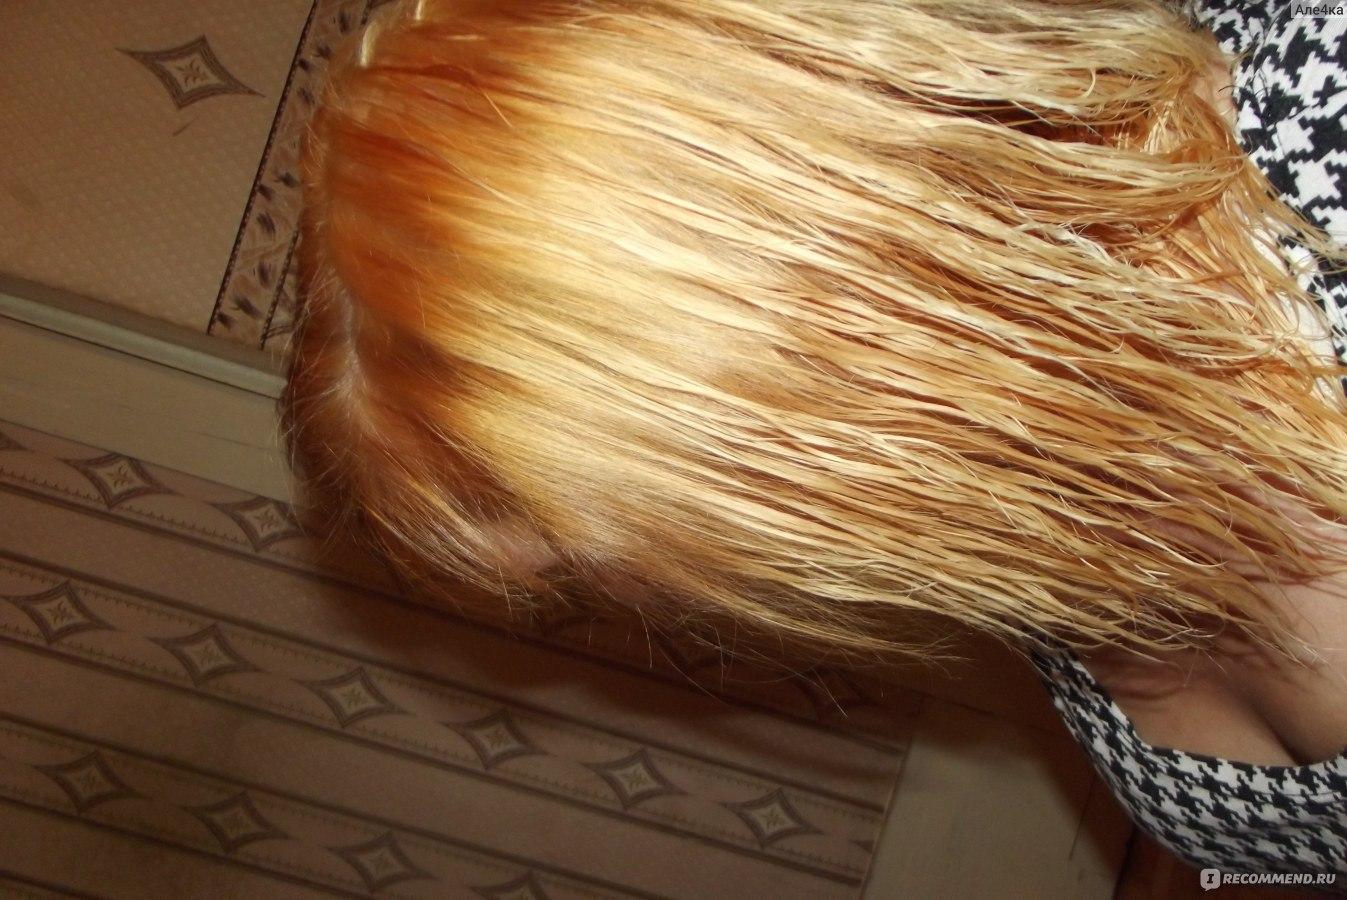 Как правильно покрасить корни волос в домашних условиях - 7я.ру